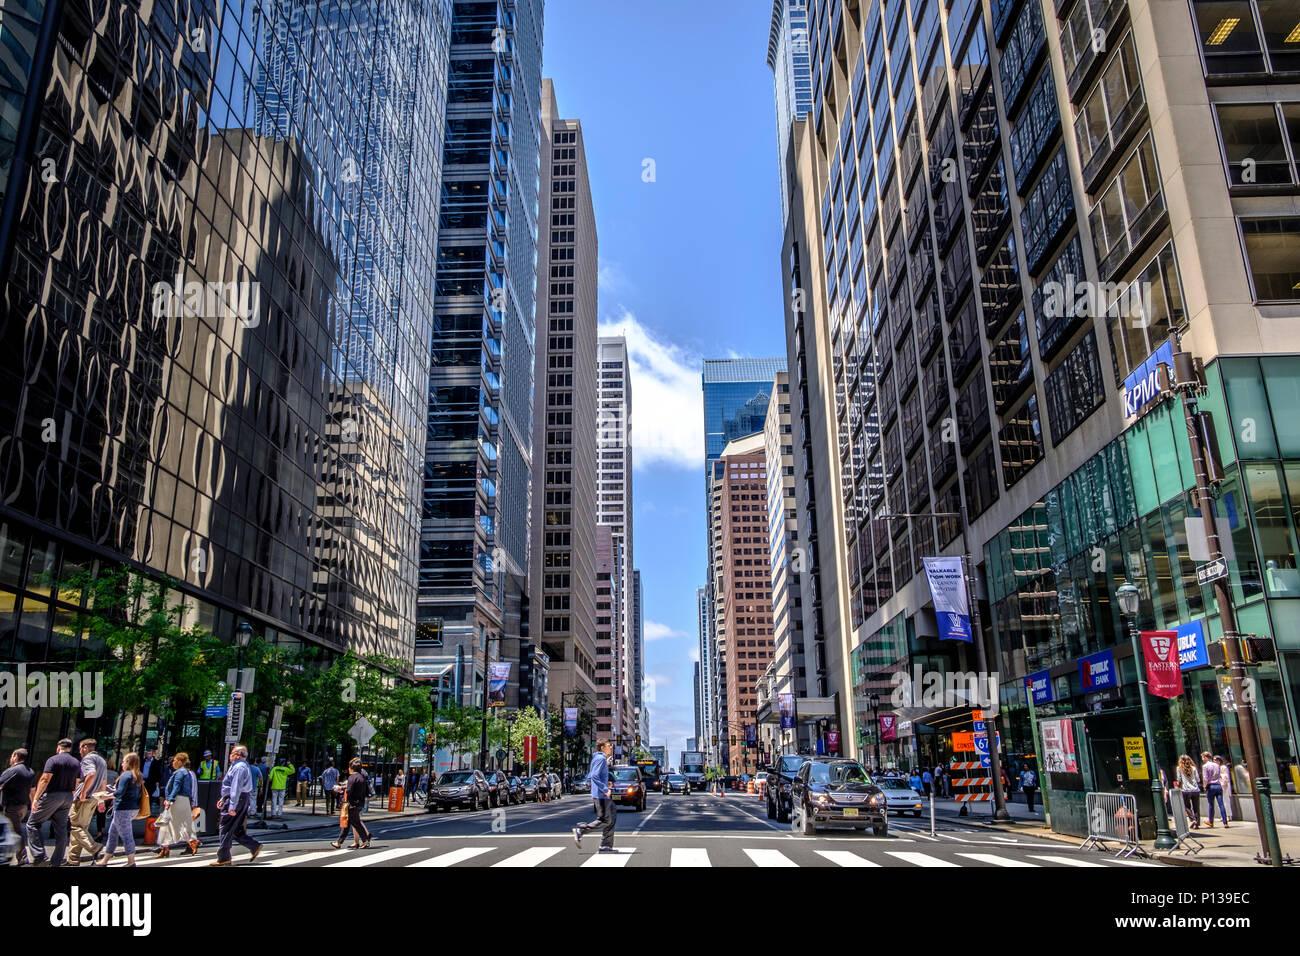 Busy Market Street with crosswalk in downtown center city Philadelphia, Pennsylvania, USA - Stock Image